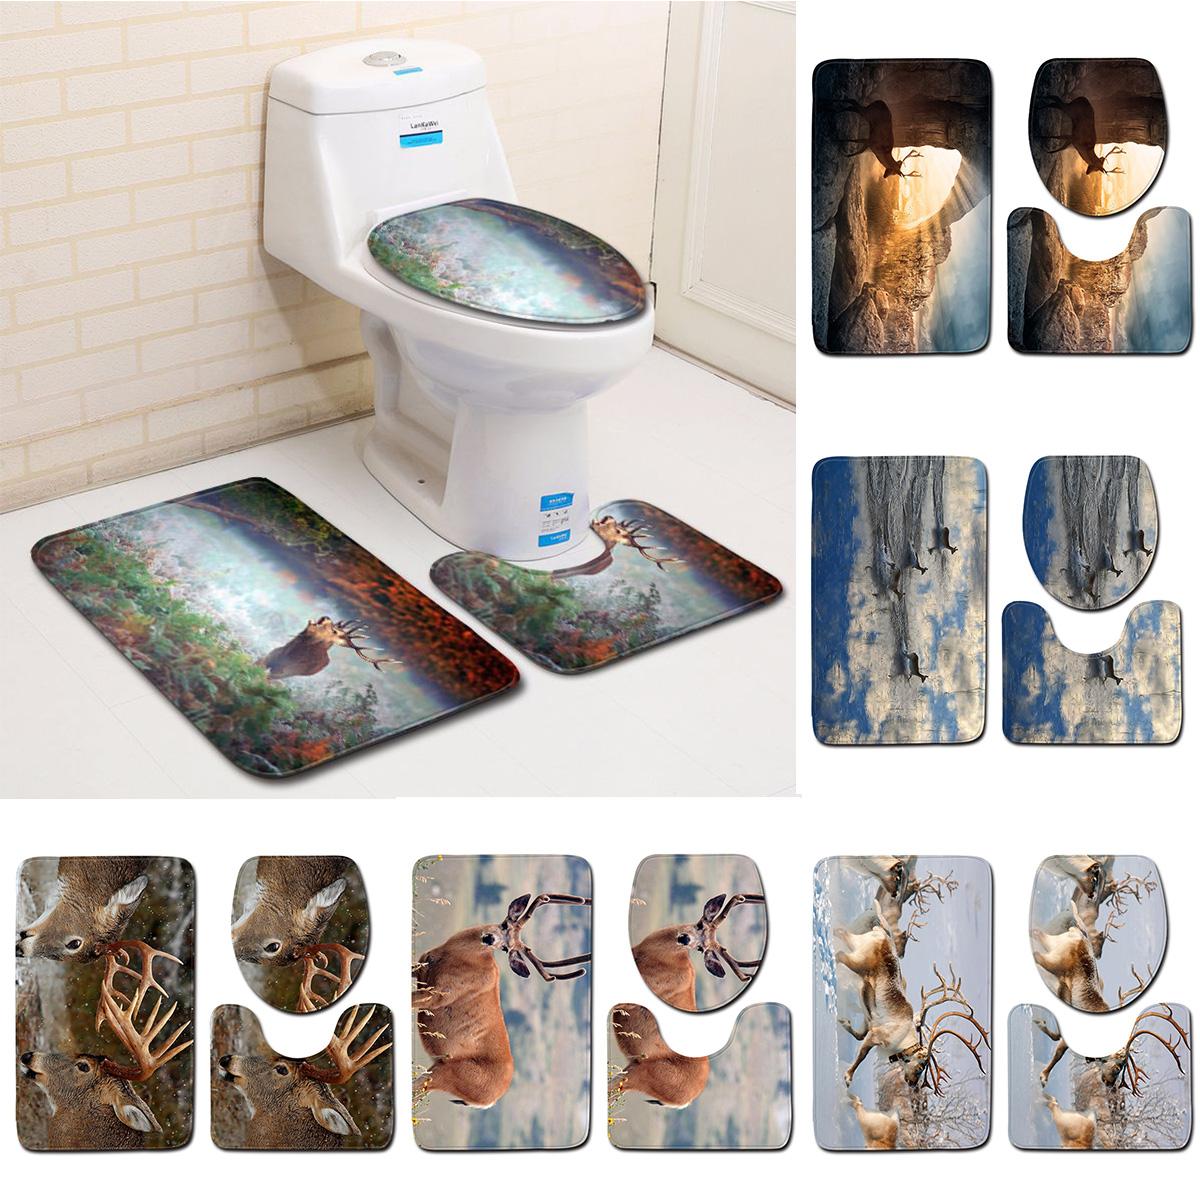 Deer Bathroom Bath Mat Carpet Rug Sets